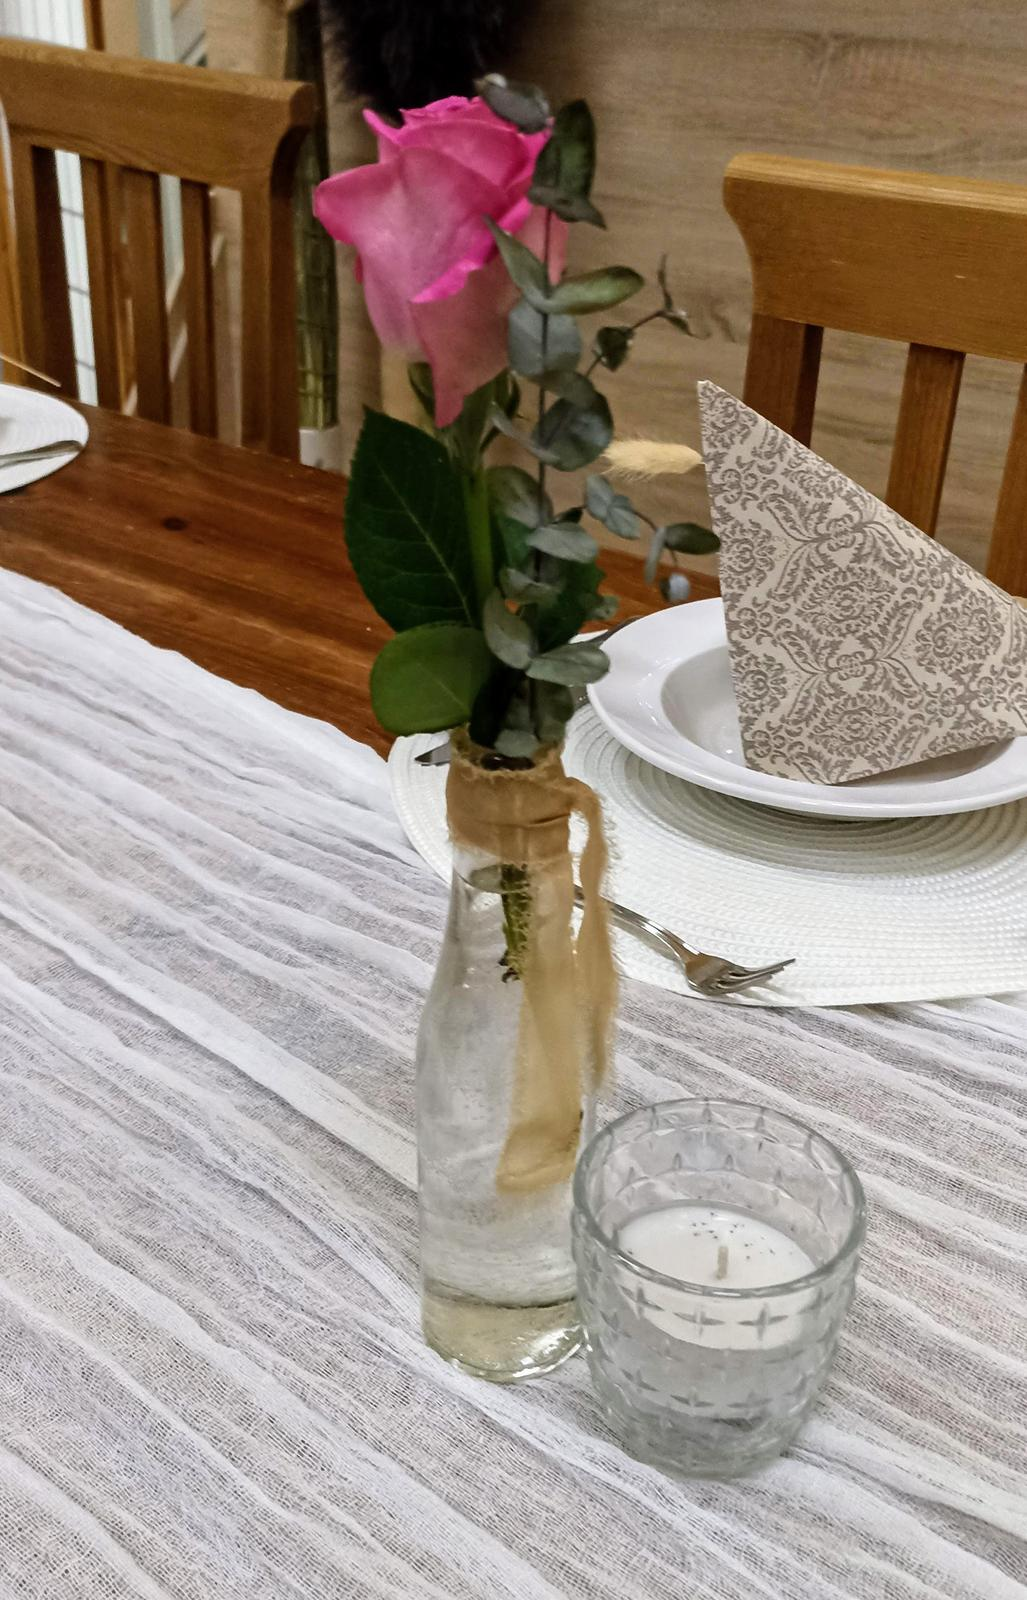 Sklenené fľašky/vázy - Obrázok č. 1